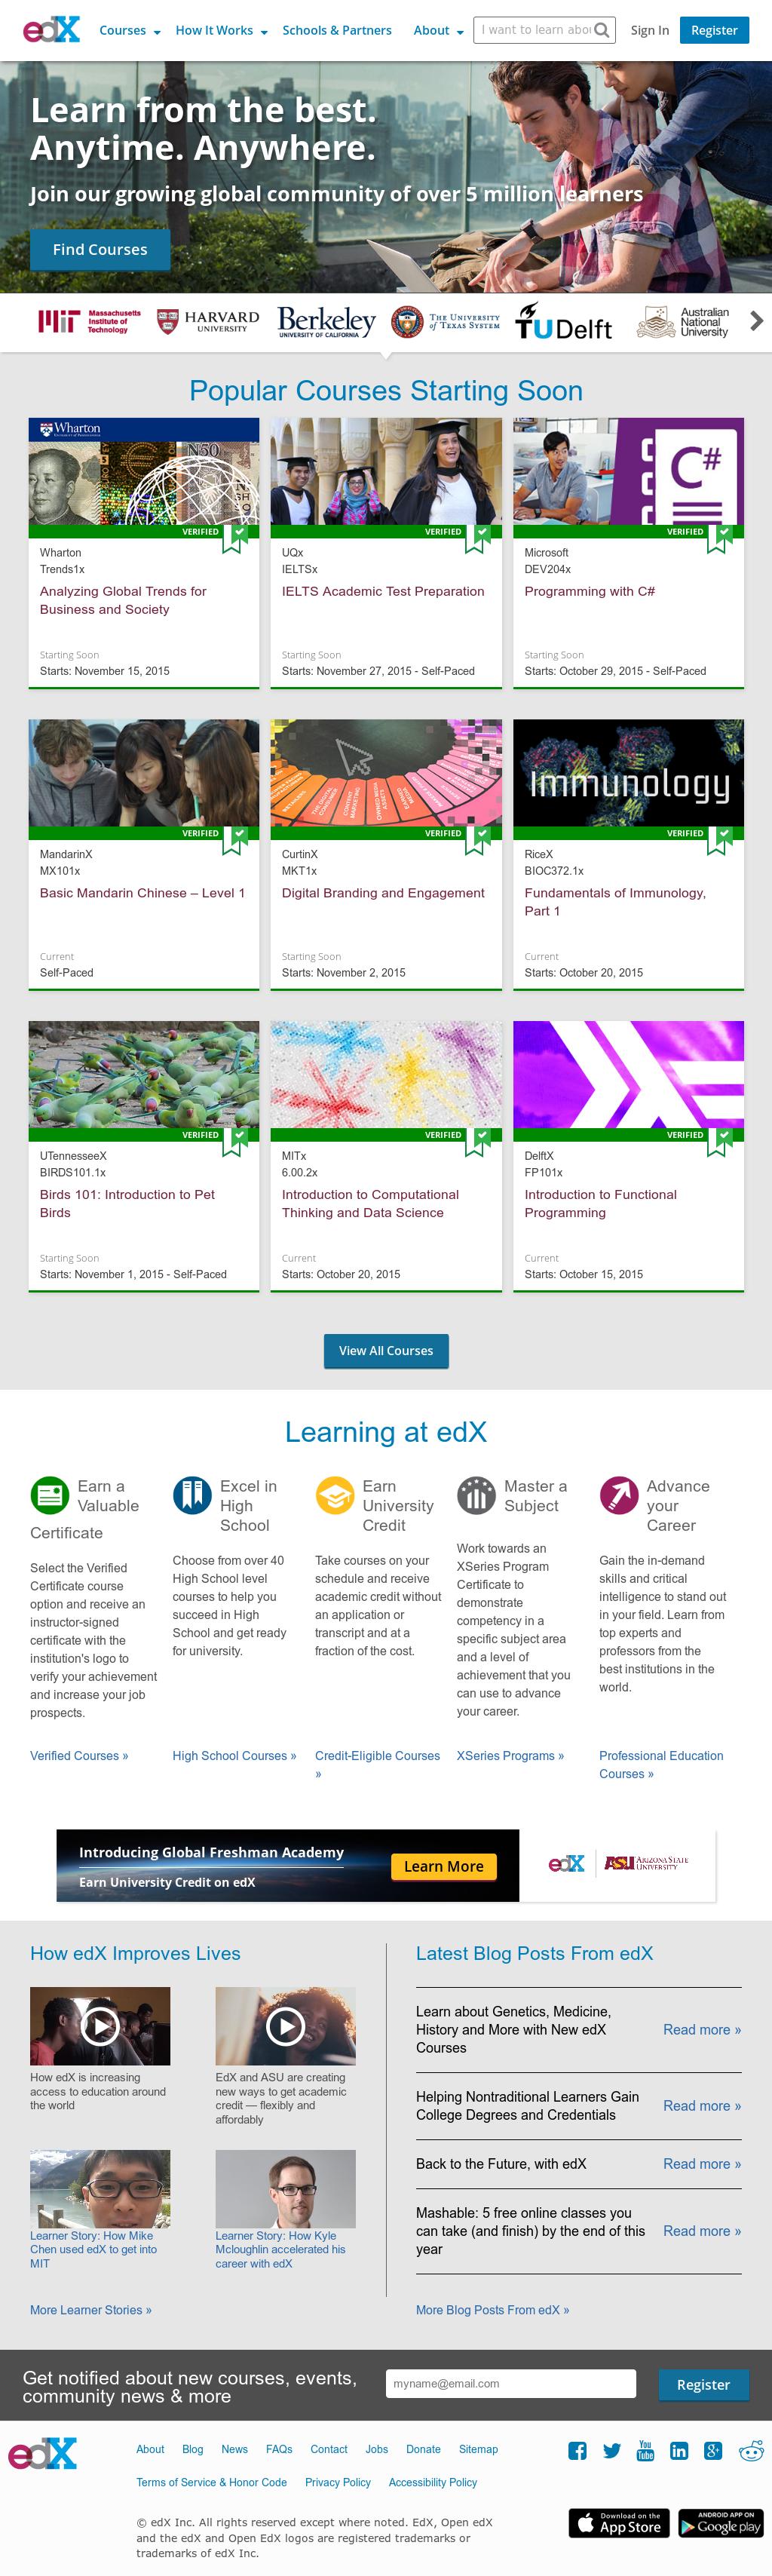 Data Science R Basics Certificate By Harvard University Edx